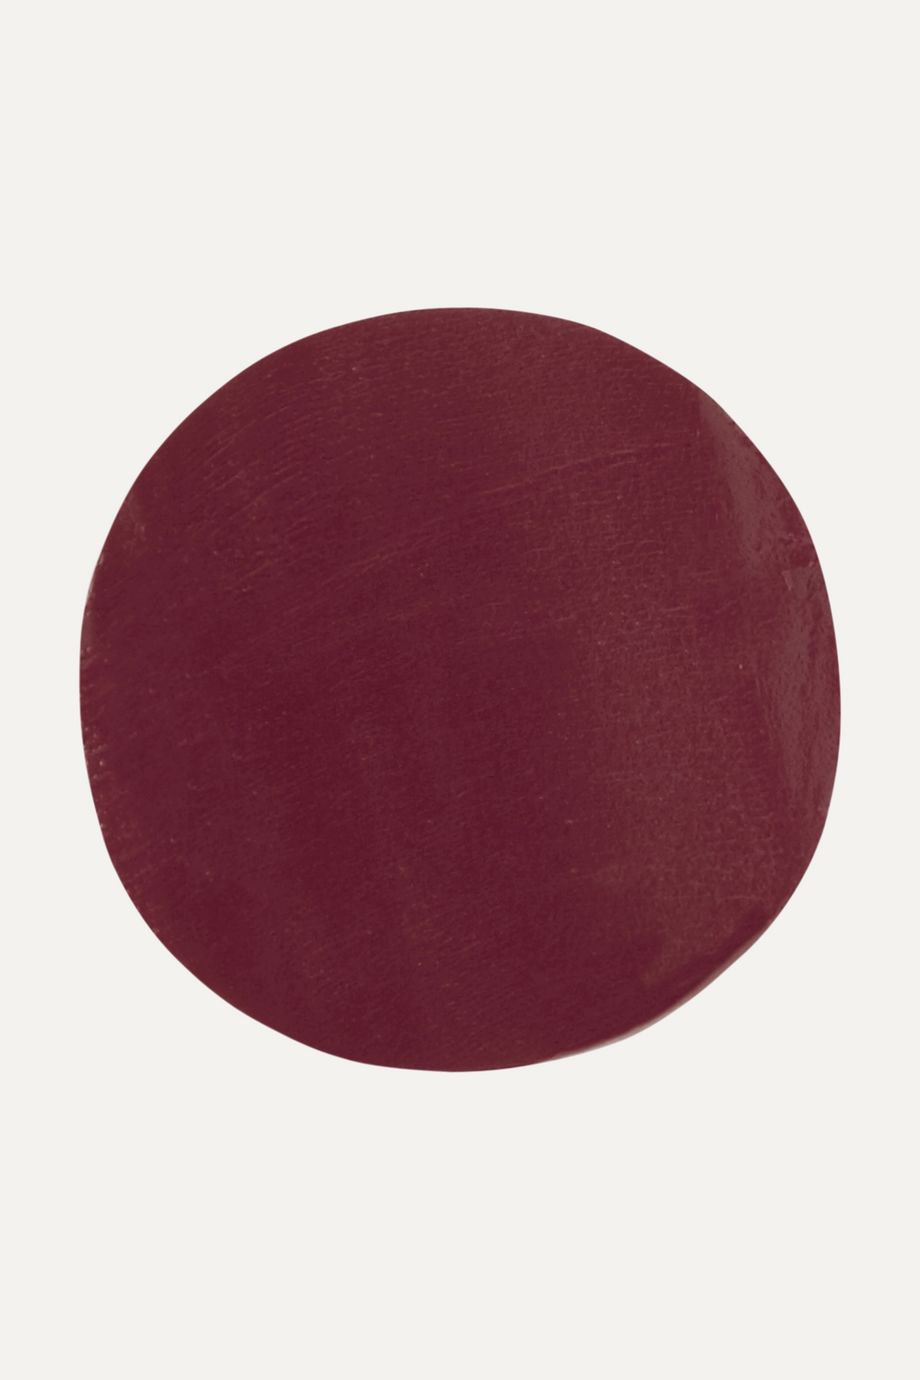 Kevyn Aucoin The Expert Lip Color - Bloodroses Noir